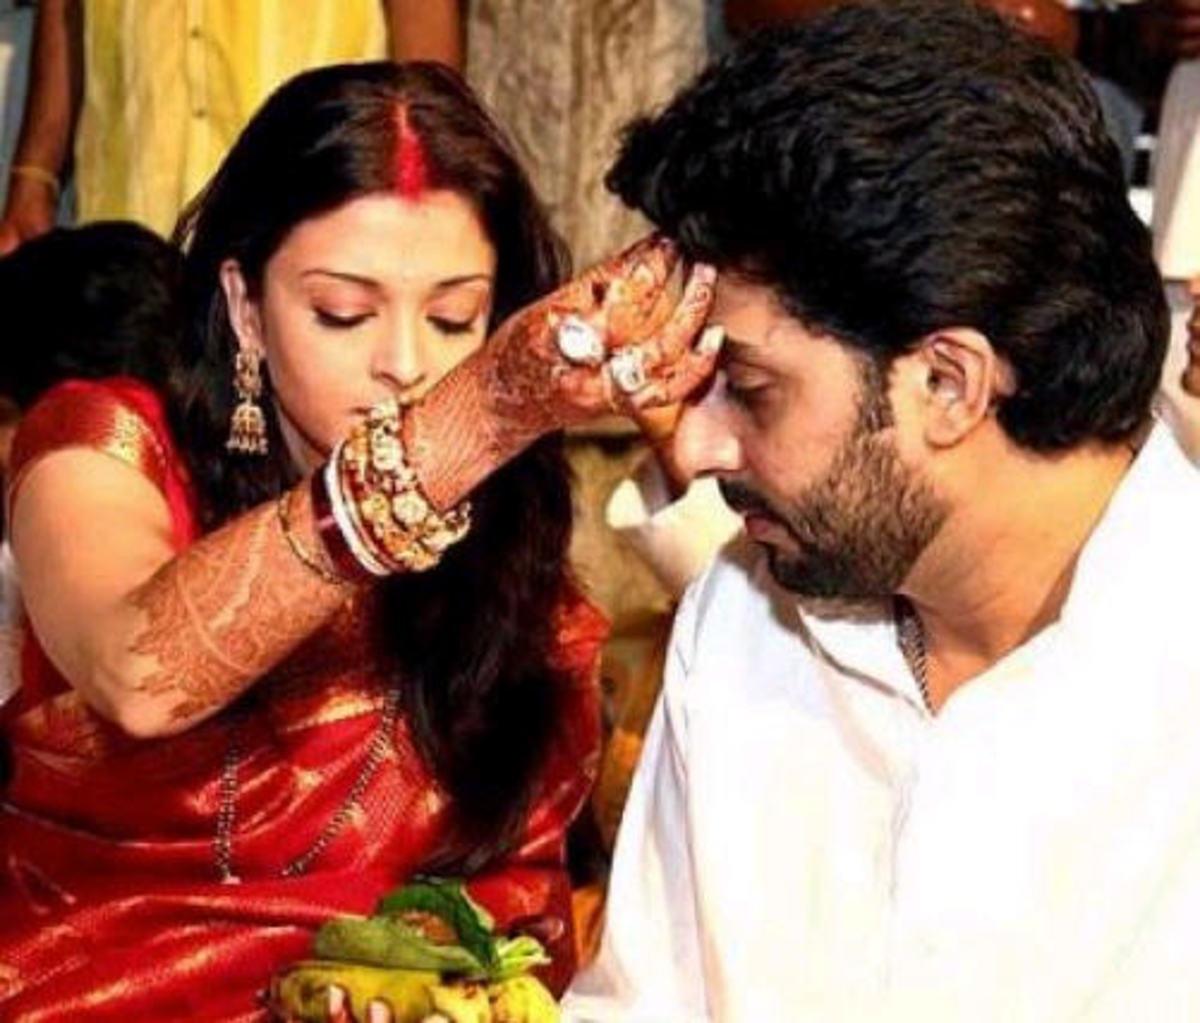 Aishwarya Rai with husband Aishwarya looking at